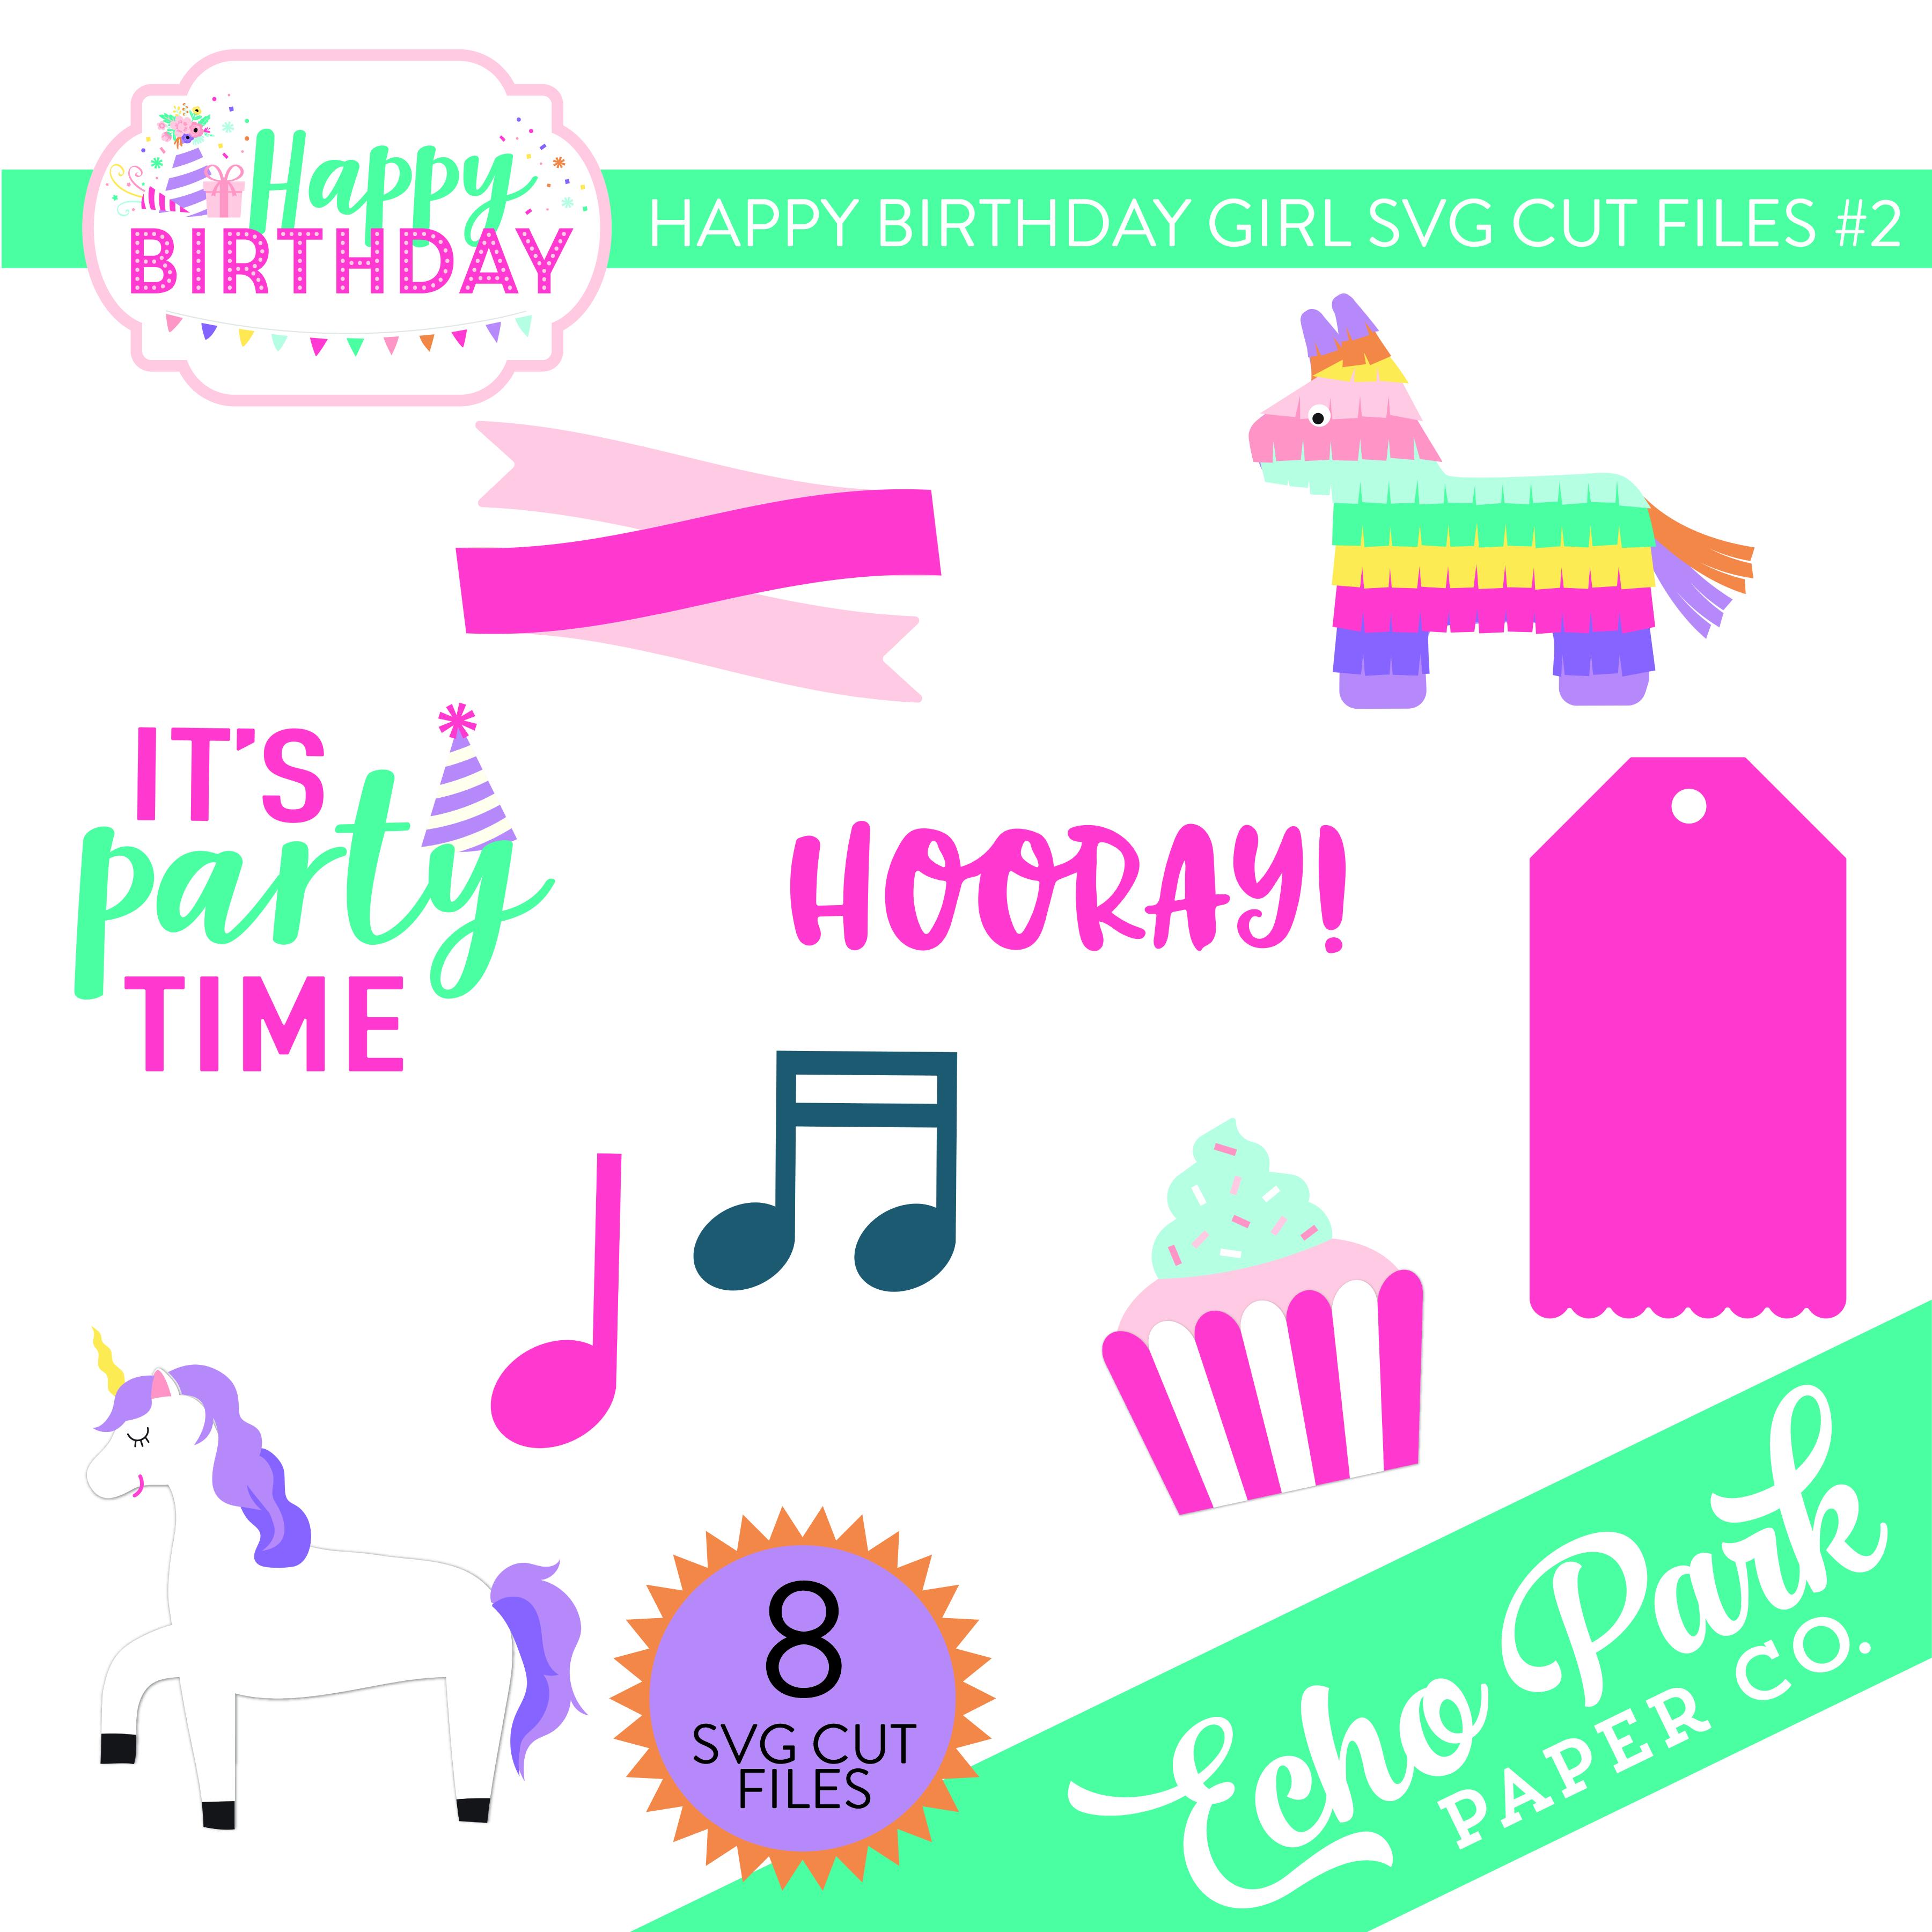 Happy Birthday Girl SVG Cut Files #2